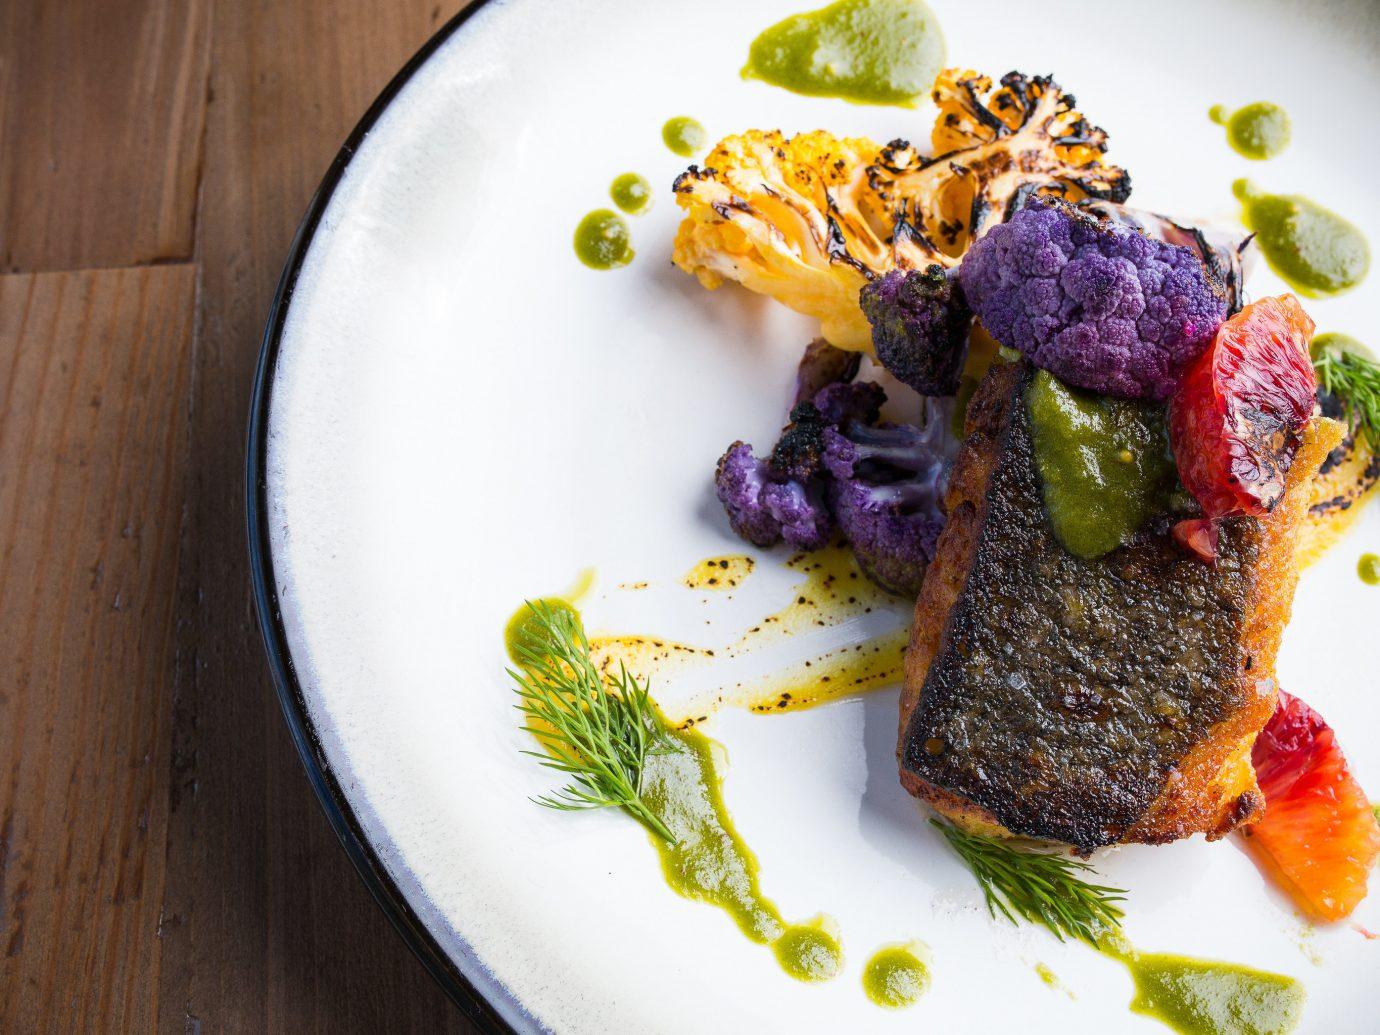 Food + Drink Trip Ideas plate food table dish plant produce meat white fish meal vegetable steak cuisine herb arranged sliced piece de resistance